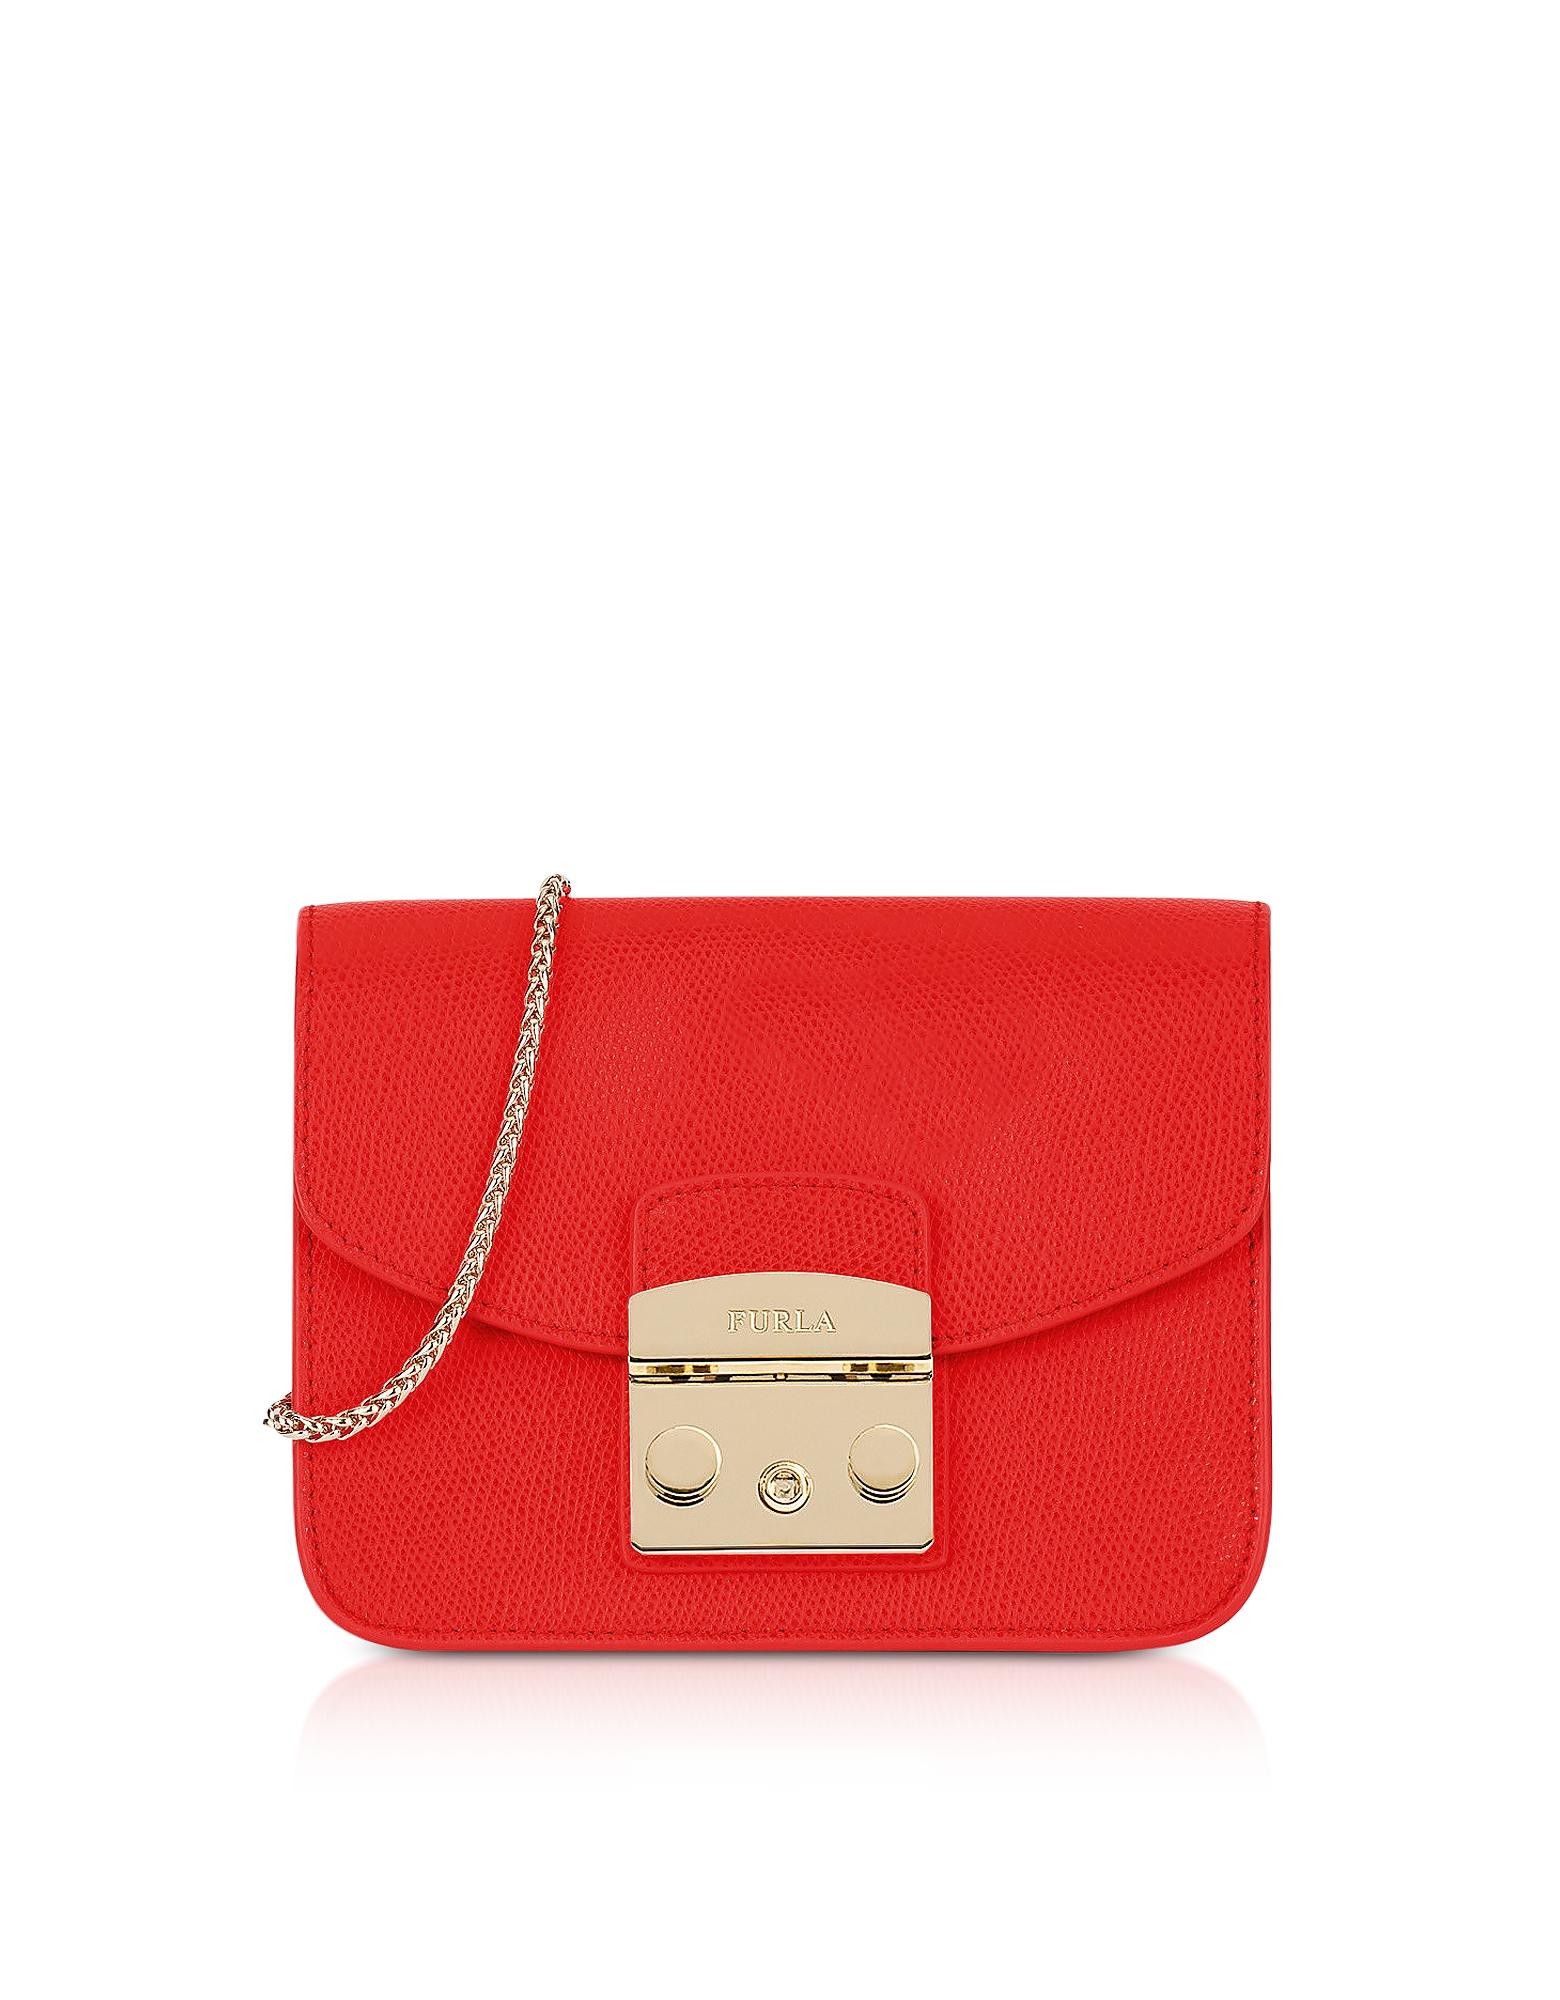 Furla Handbags, Metropolis Mini Crossbody Bag w/Chain Strap